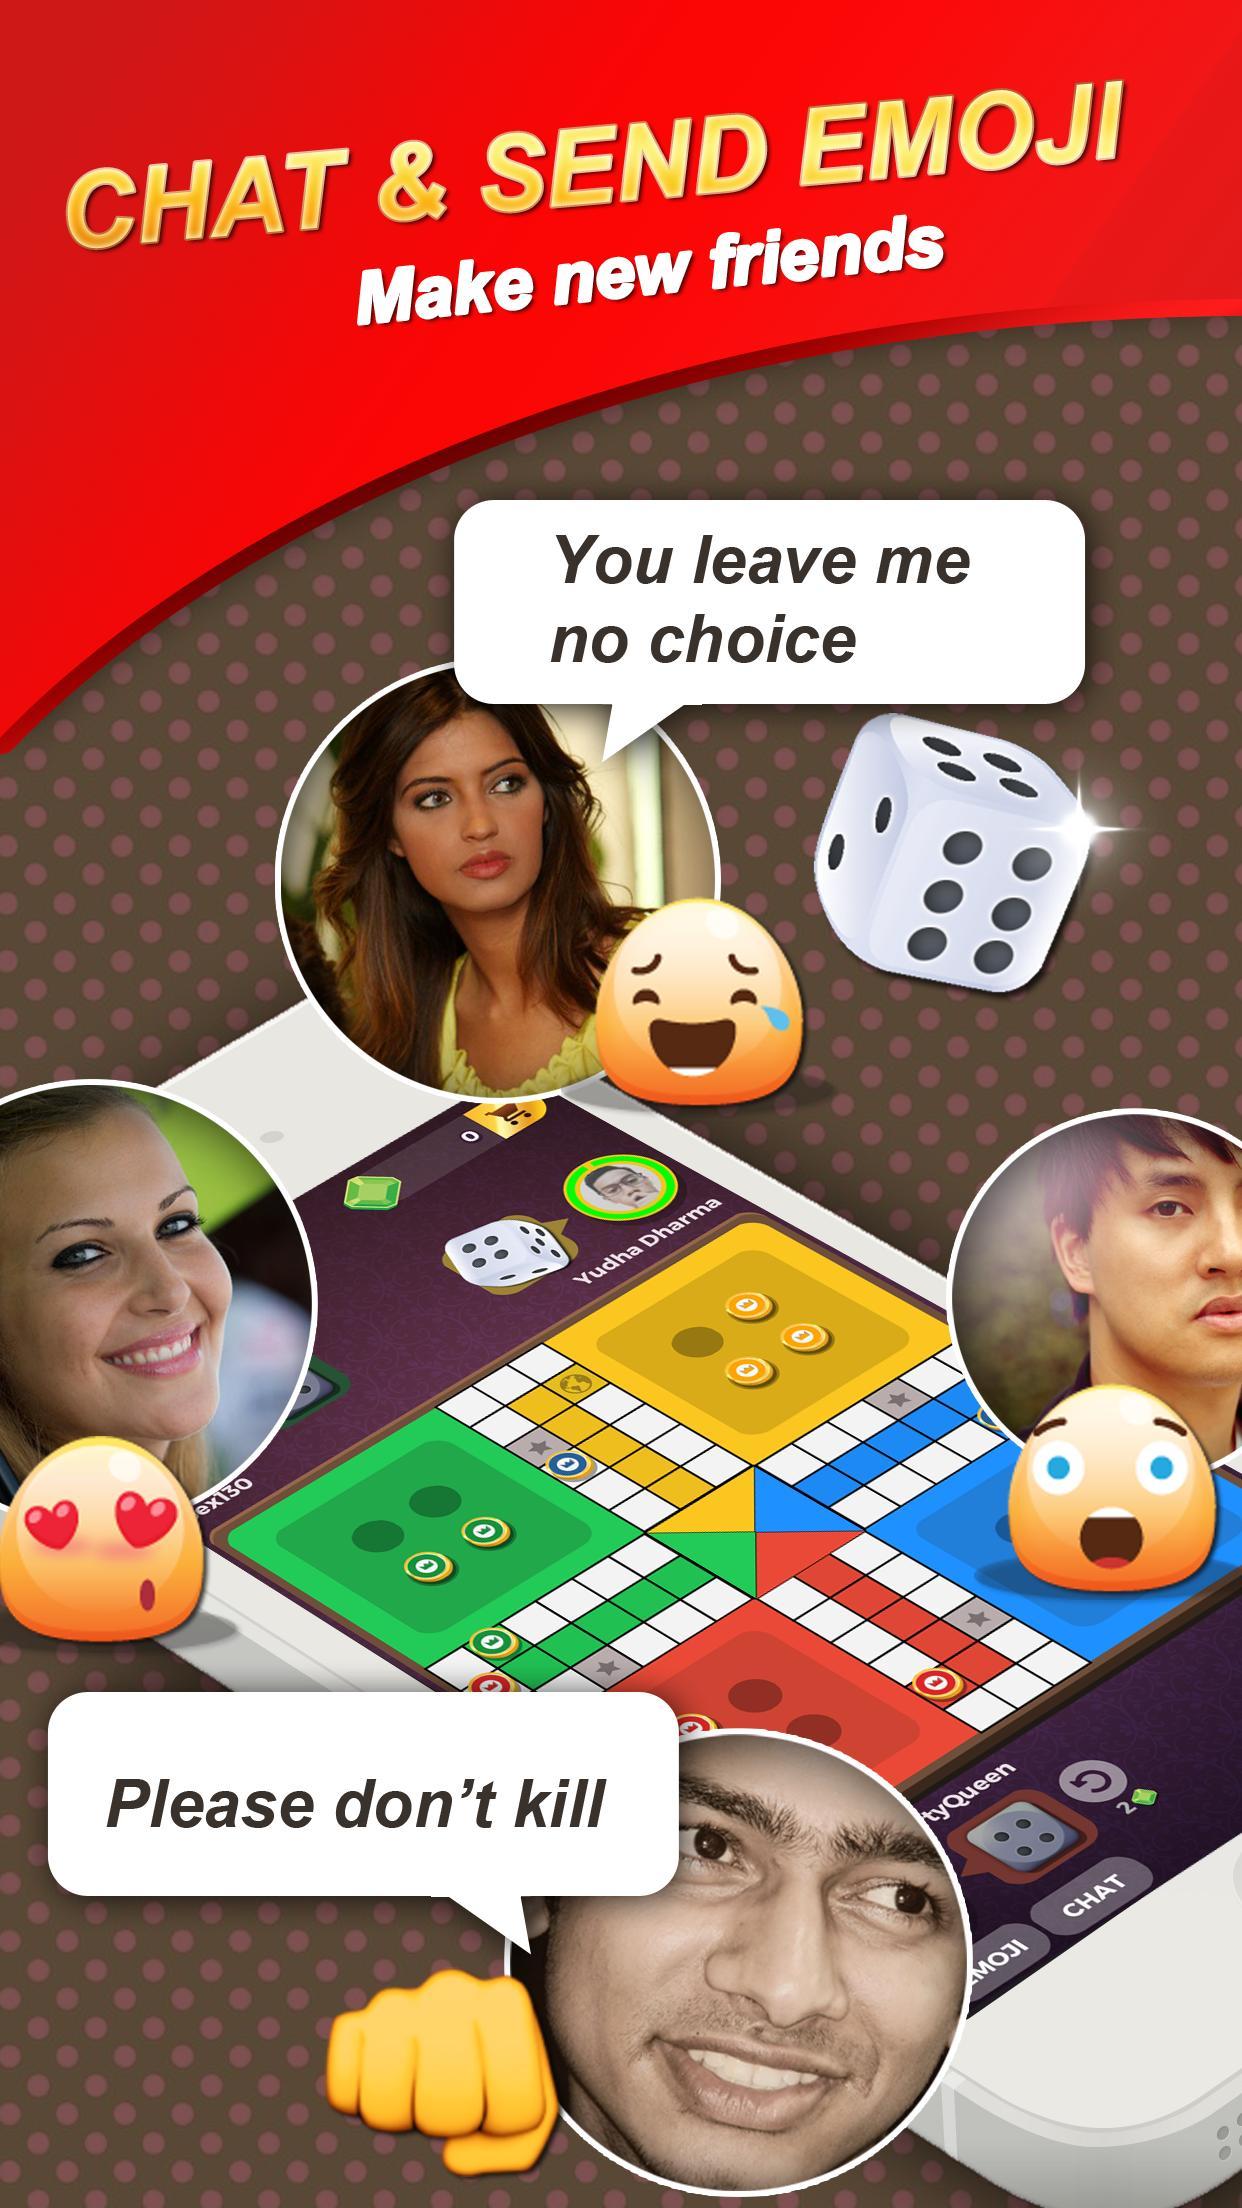 dice dating app download